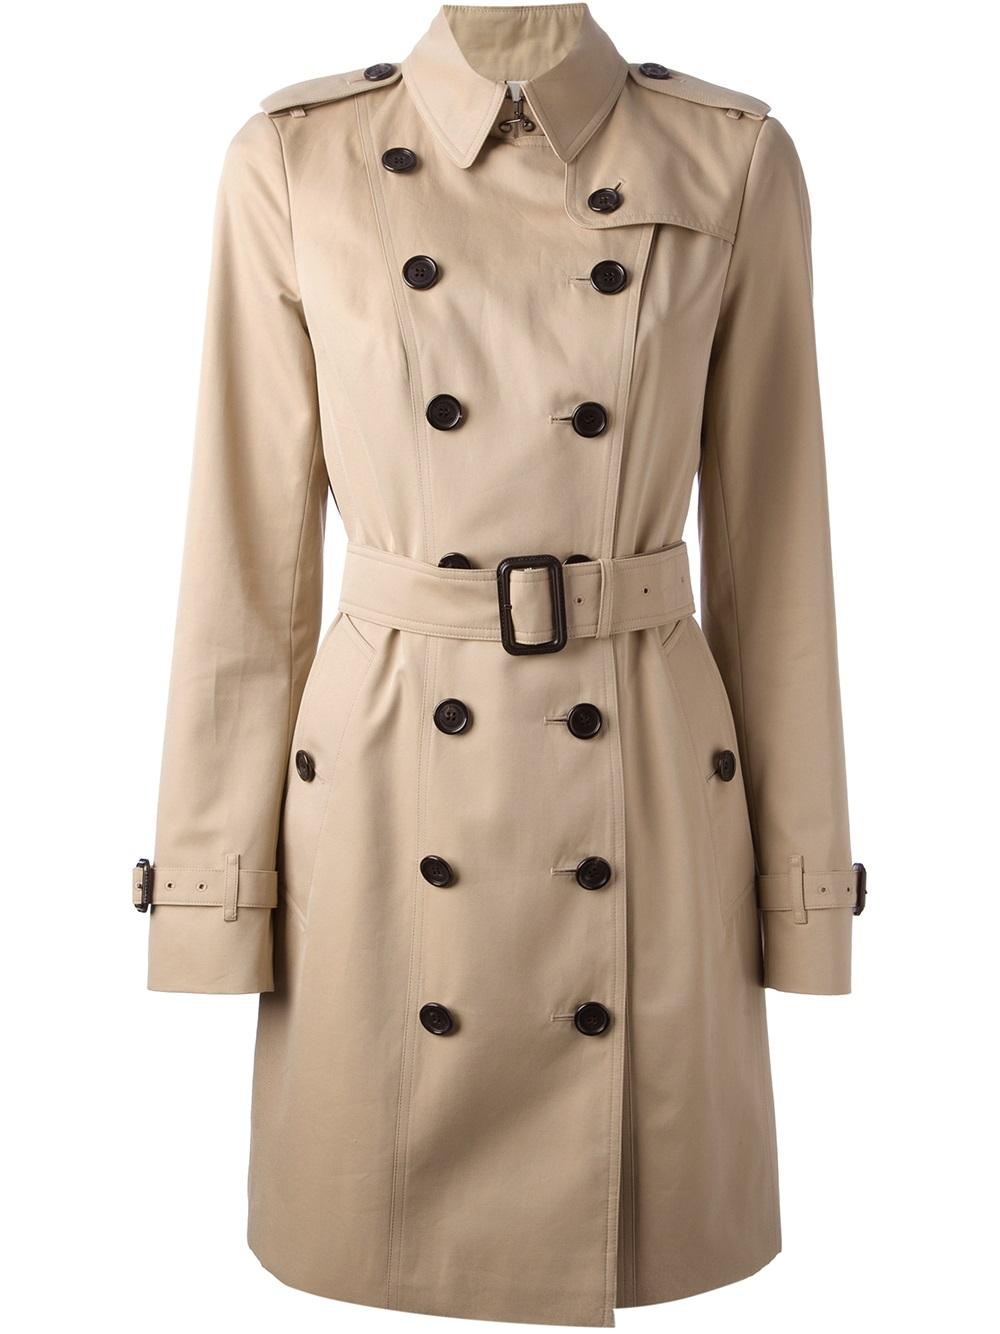 burberry london 39 queensbury 39 trench coat in beige nude. Black Bedroom Furniture Sets. Home Design Ideas